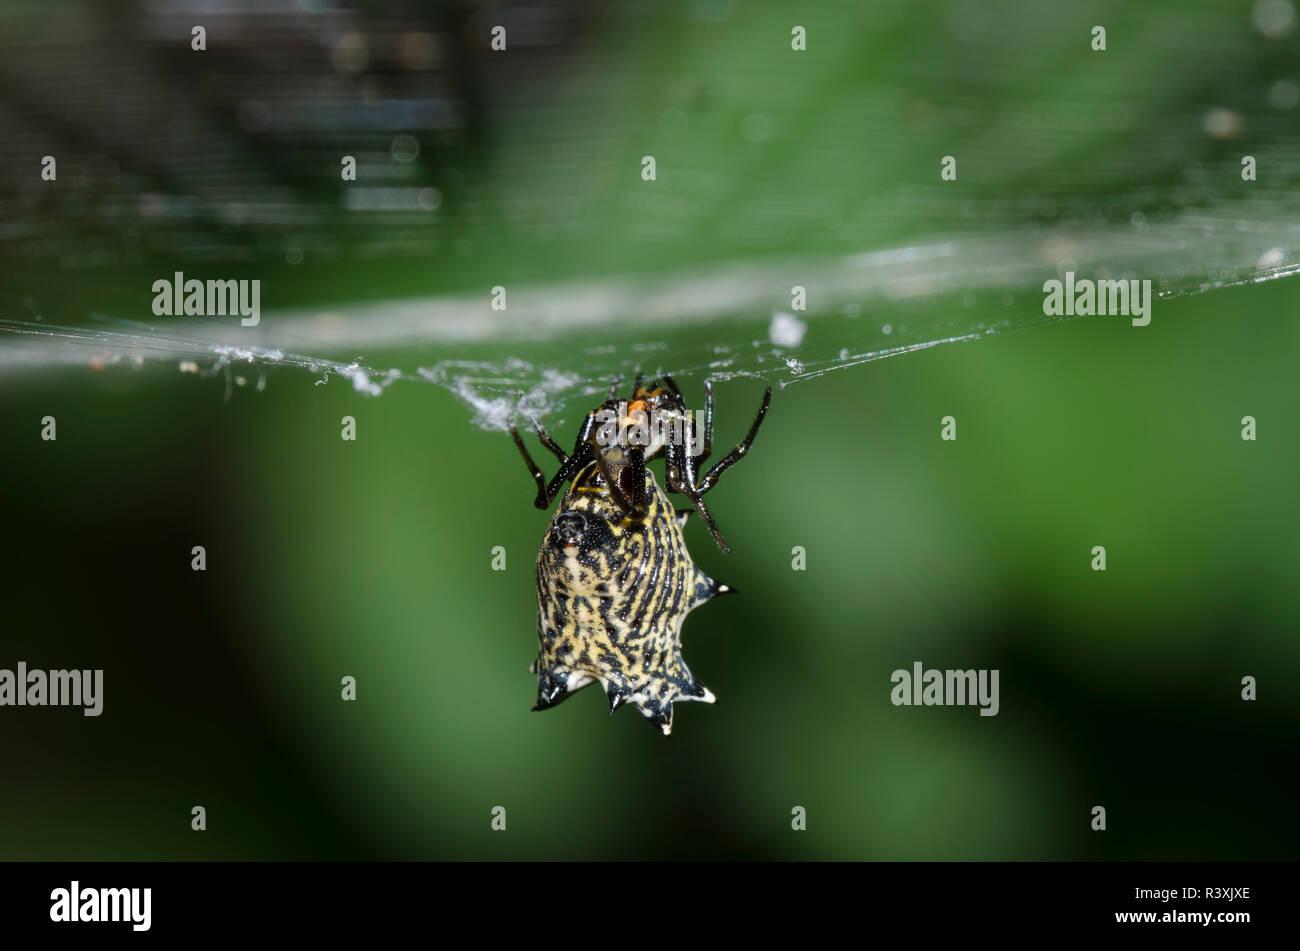 Spined Micrathena, Micrathena gracilis, hanging in horizontal orb web - Stock Image